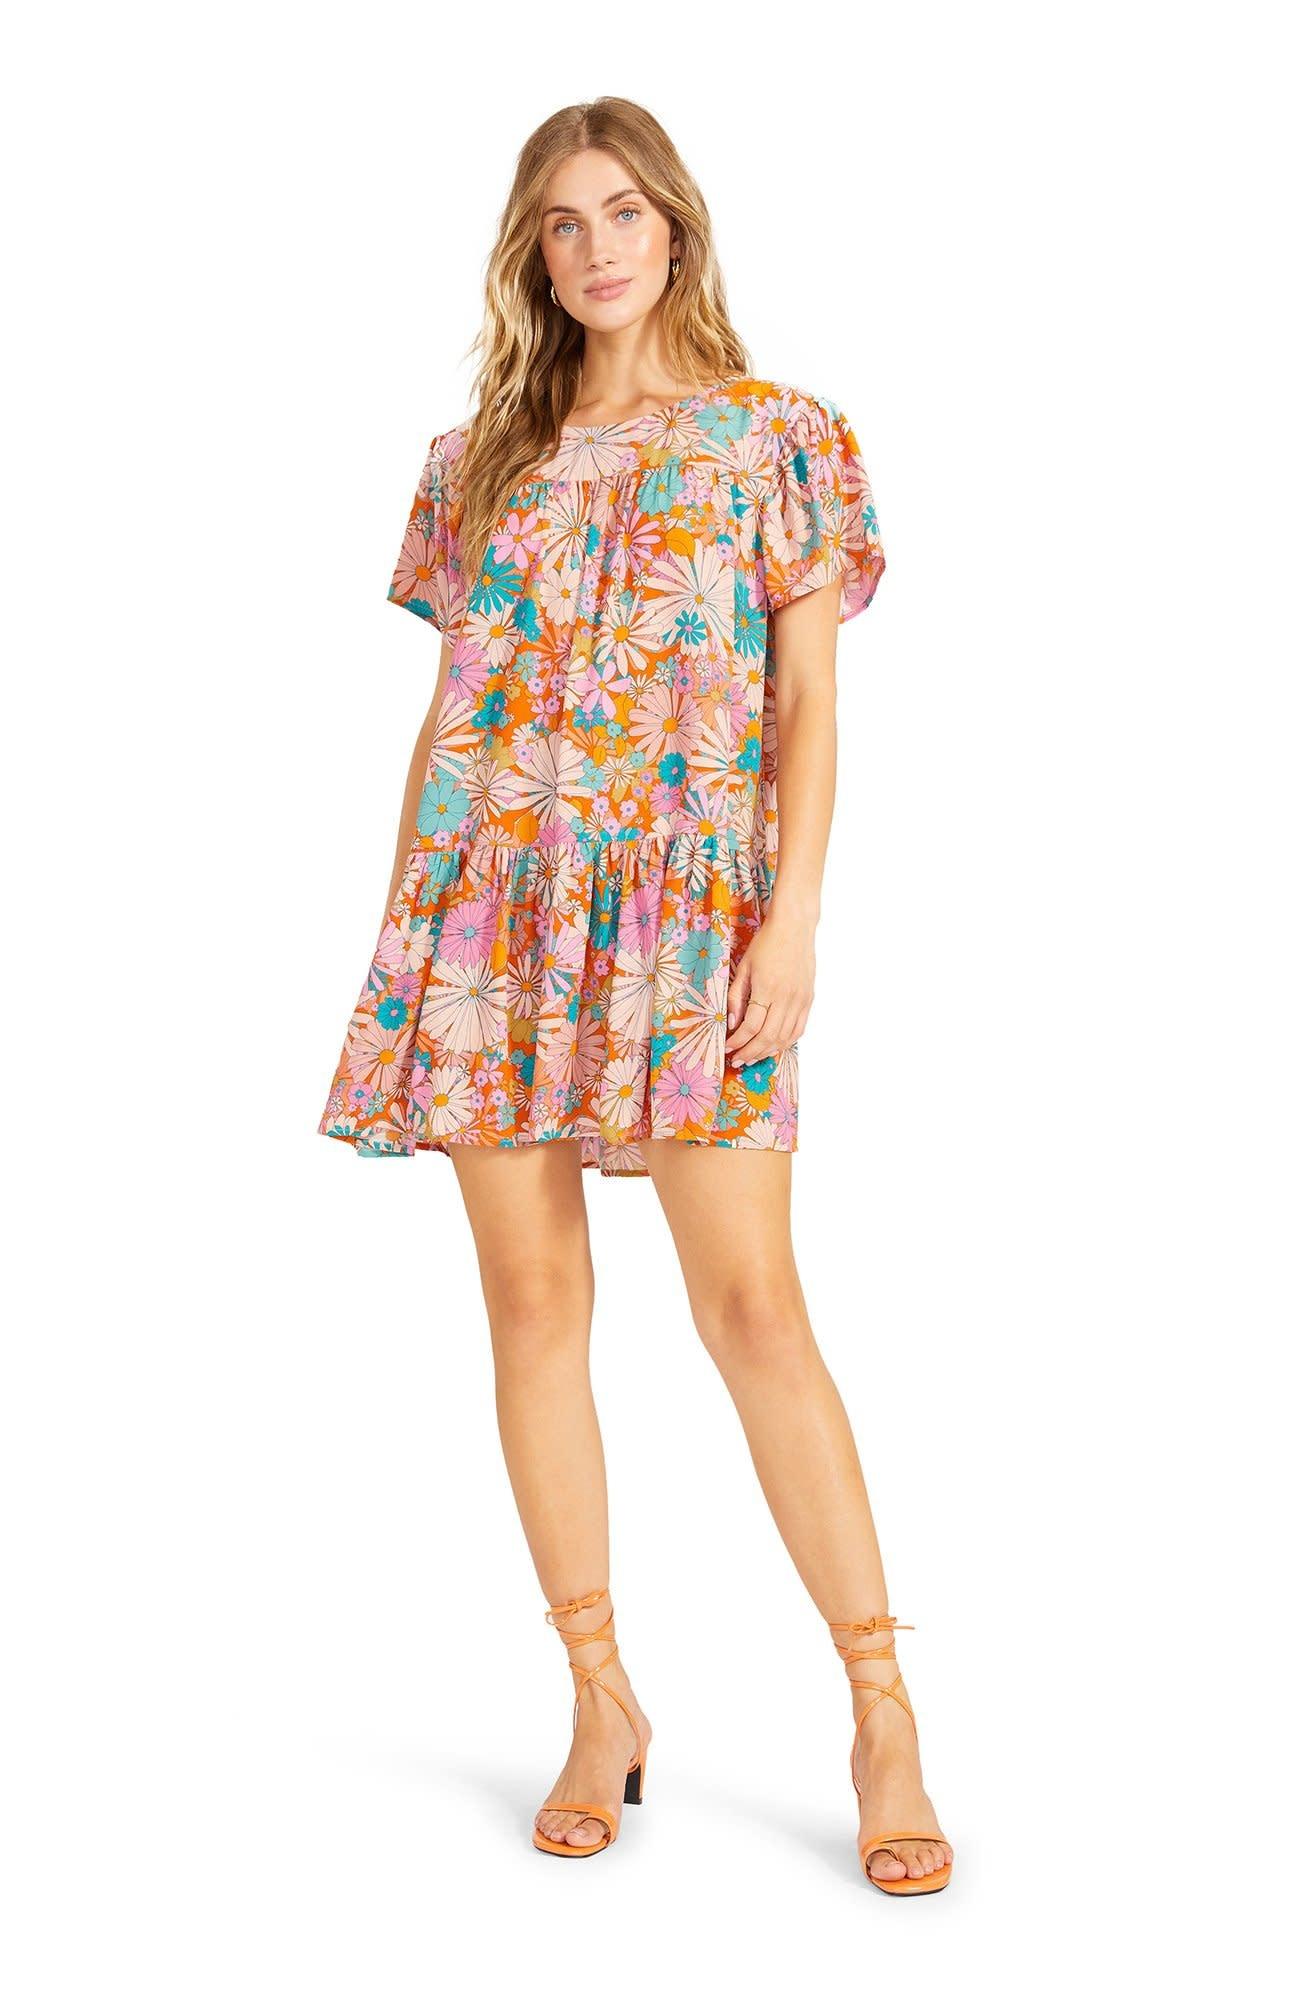 BB Dakota In Retrospect Dress